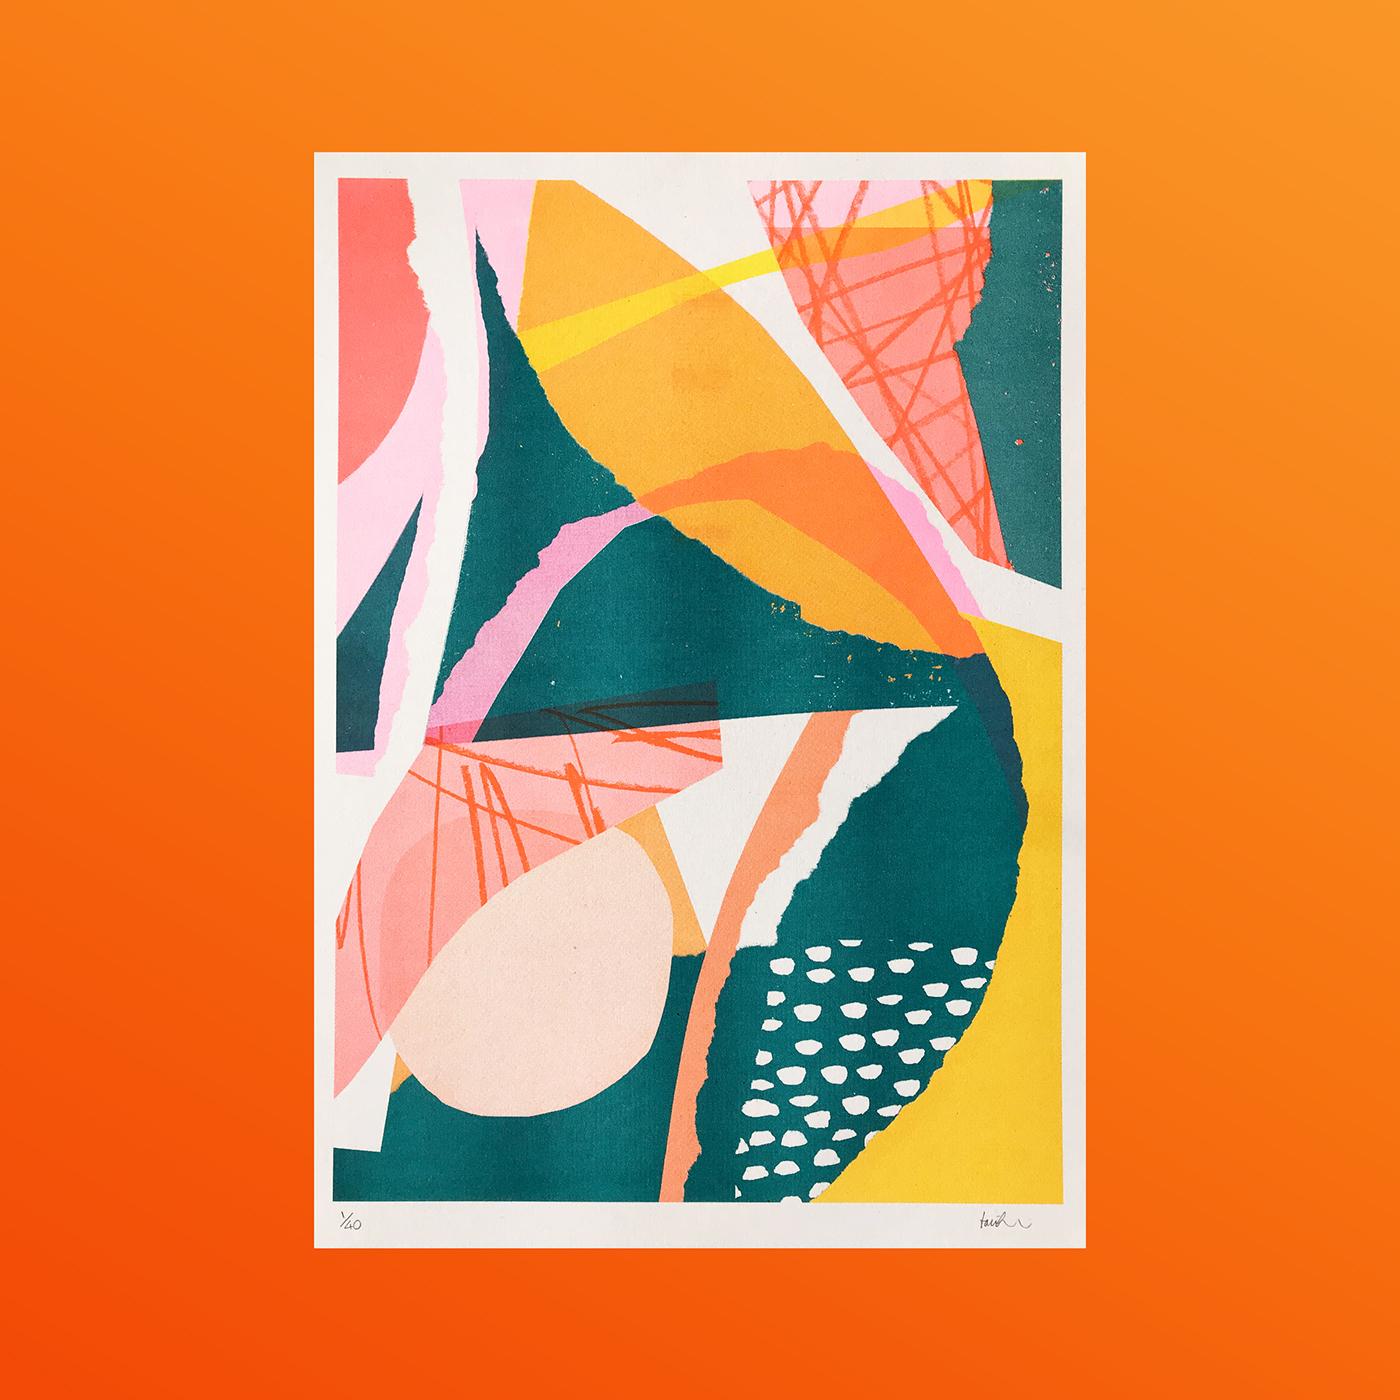 Riso risograph abstract contemporary art modern modern art print printmaking risography Abstract Art